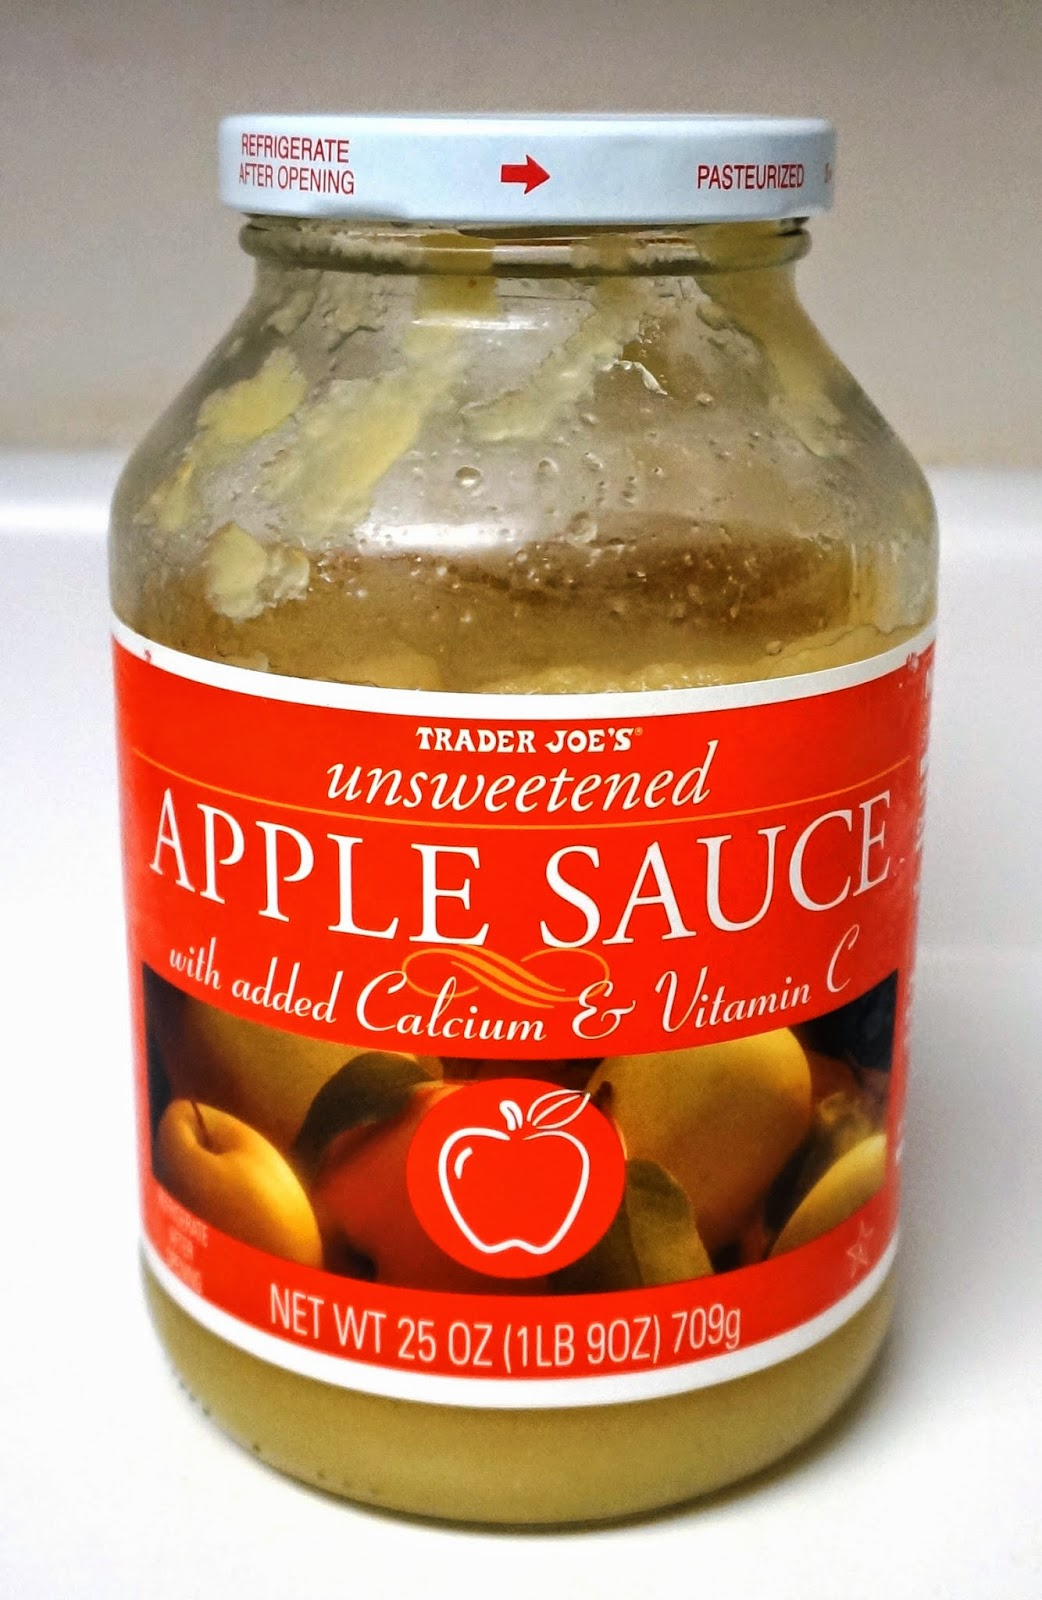 Exploring trader joe 39 s trader joe 39 s unsweetened apple for Trader joe s fish sauce